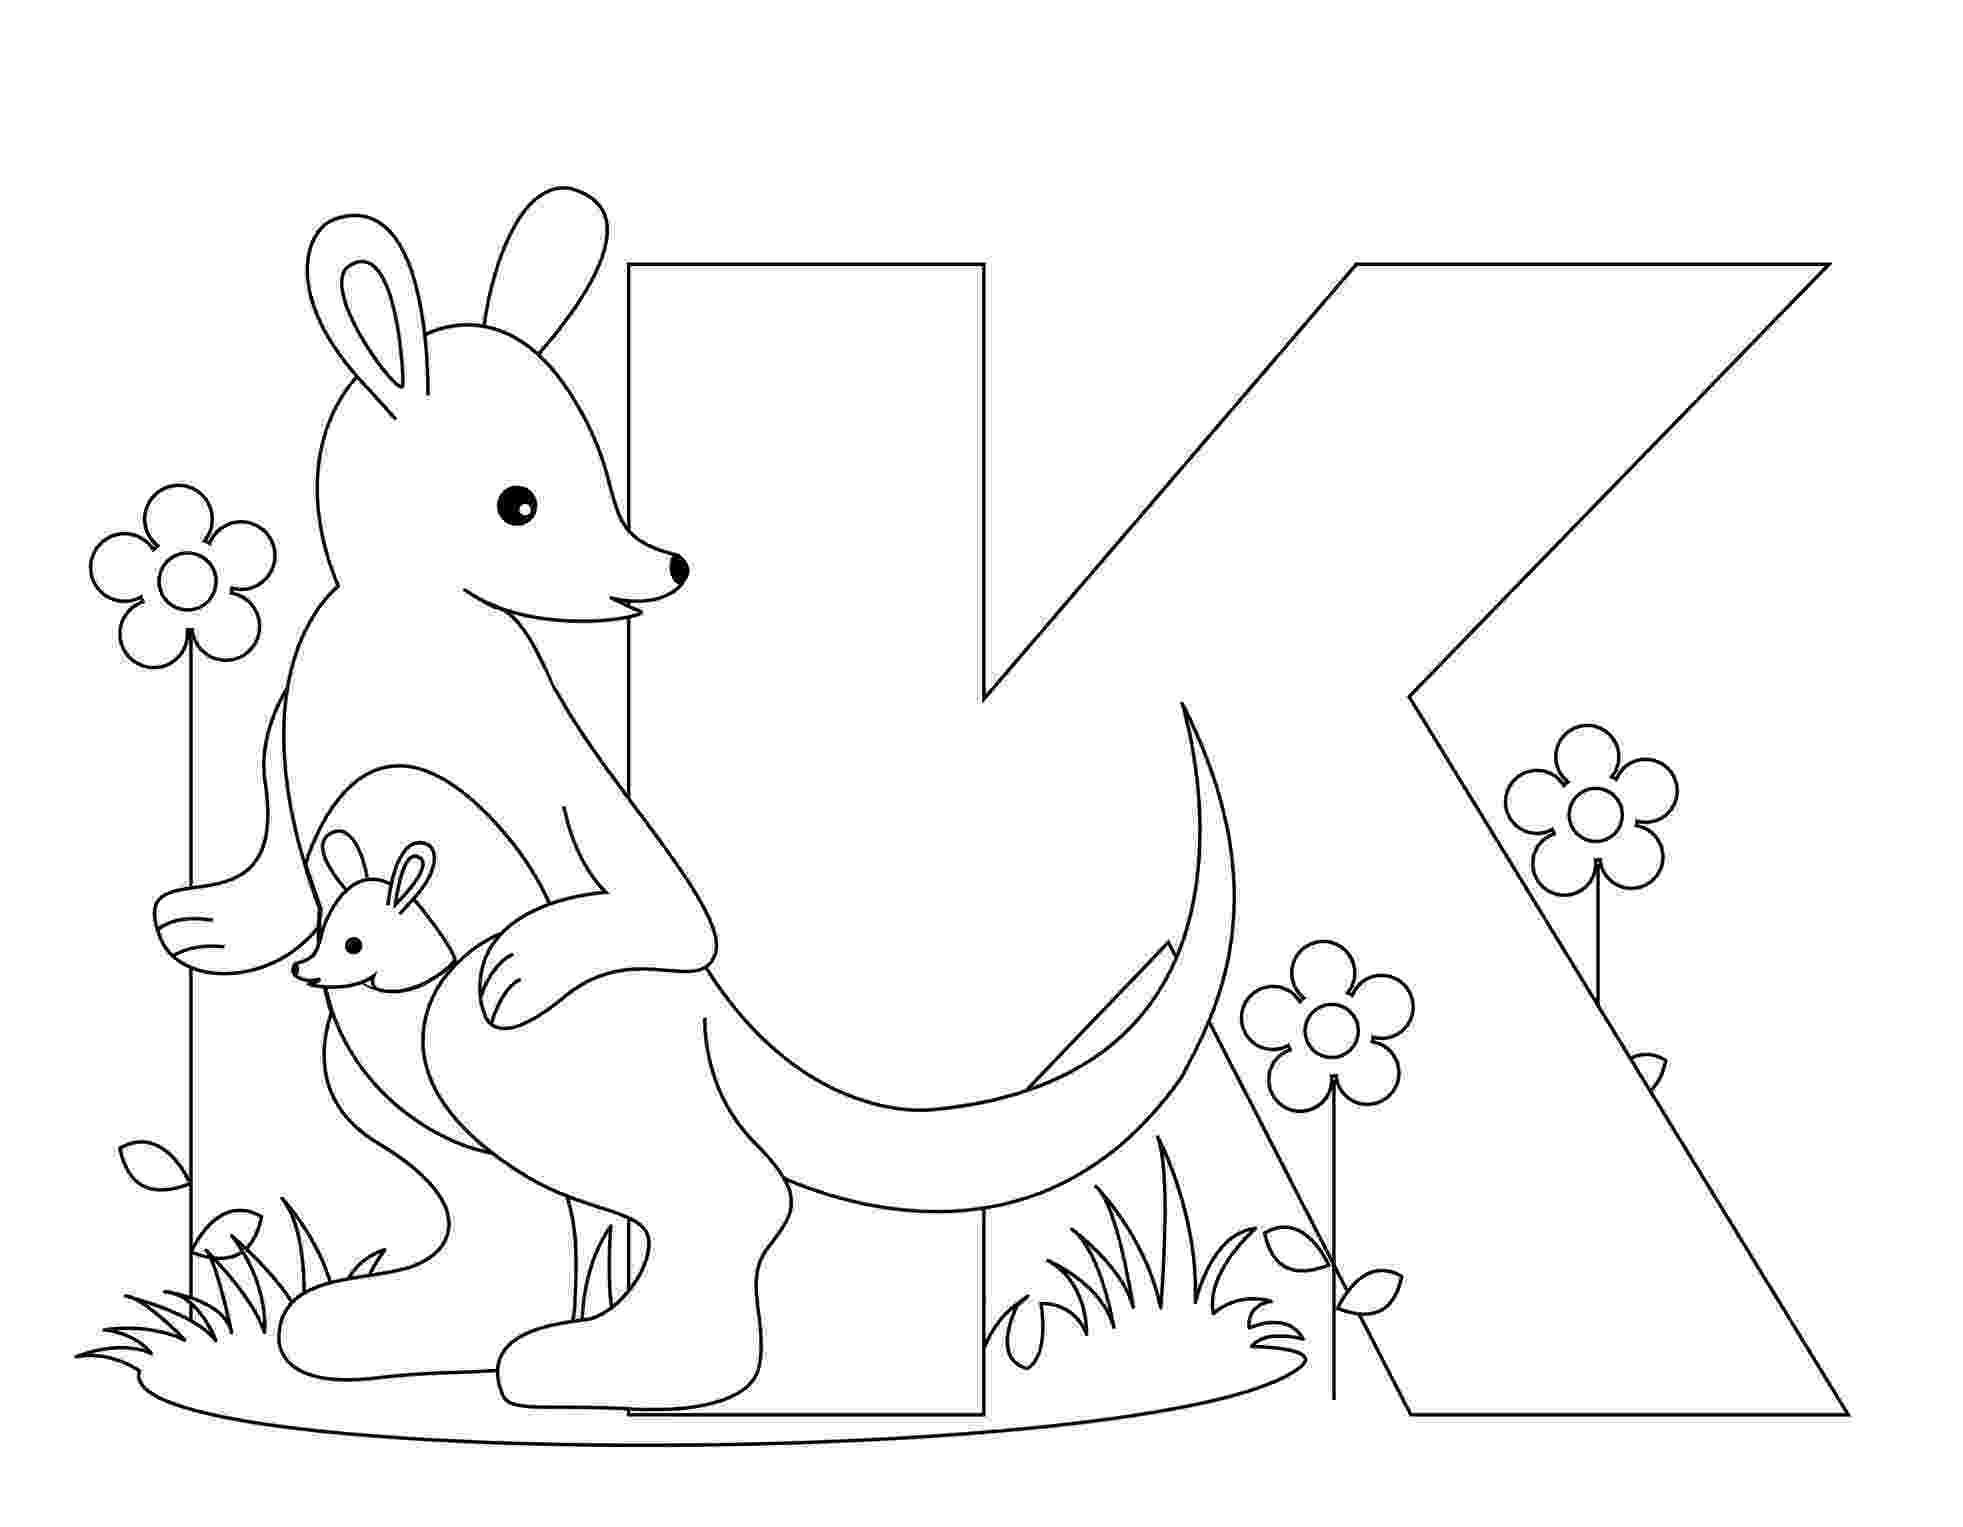 abc coloring sheets free printable alphabet coloring pages for kids best abc sheets coloring 1 3